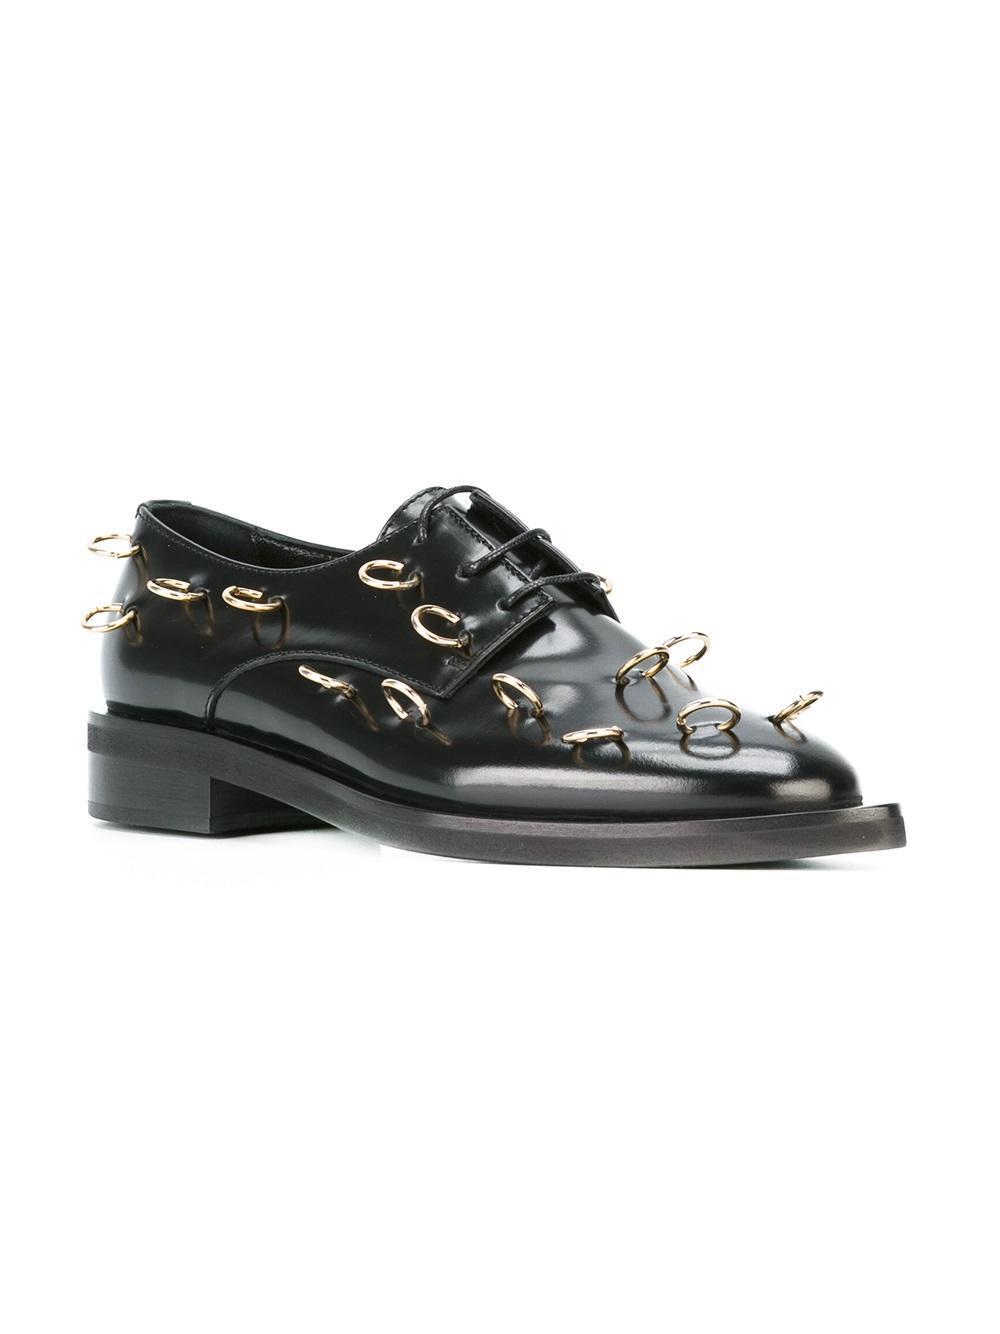 9bd4556c78 Coliac Piercing Embellished Derby Shoes in Black - Lyst